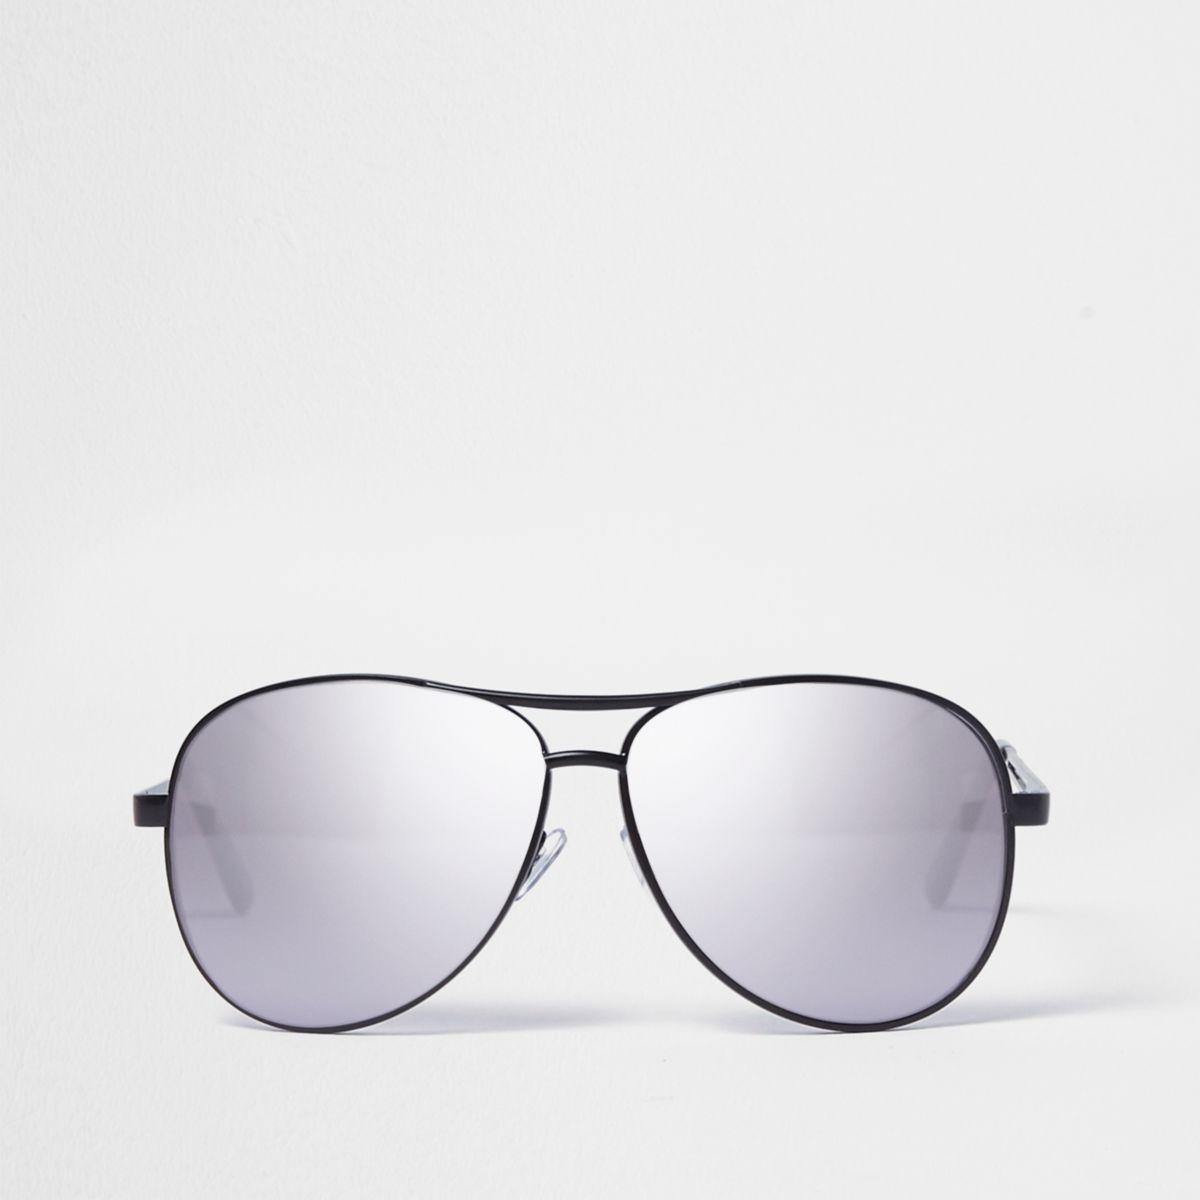 Black metal frame aviator sunglasses